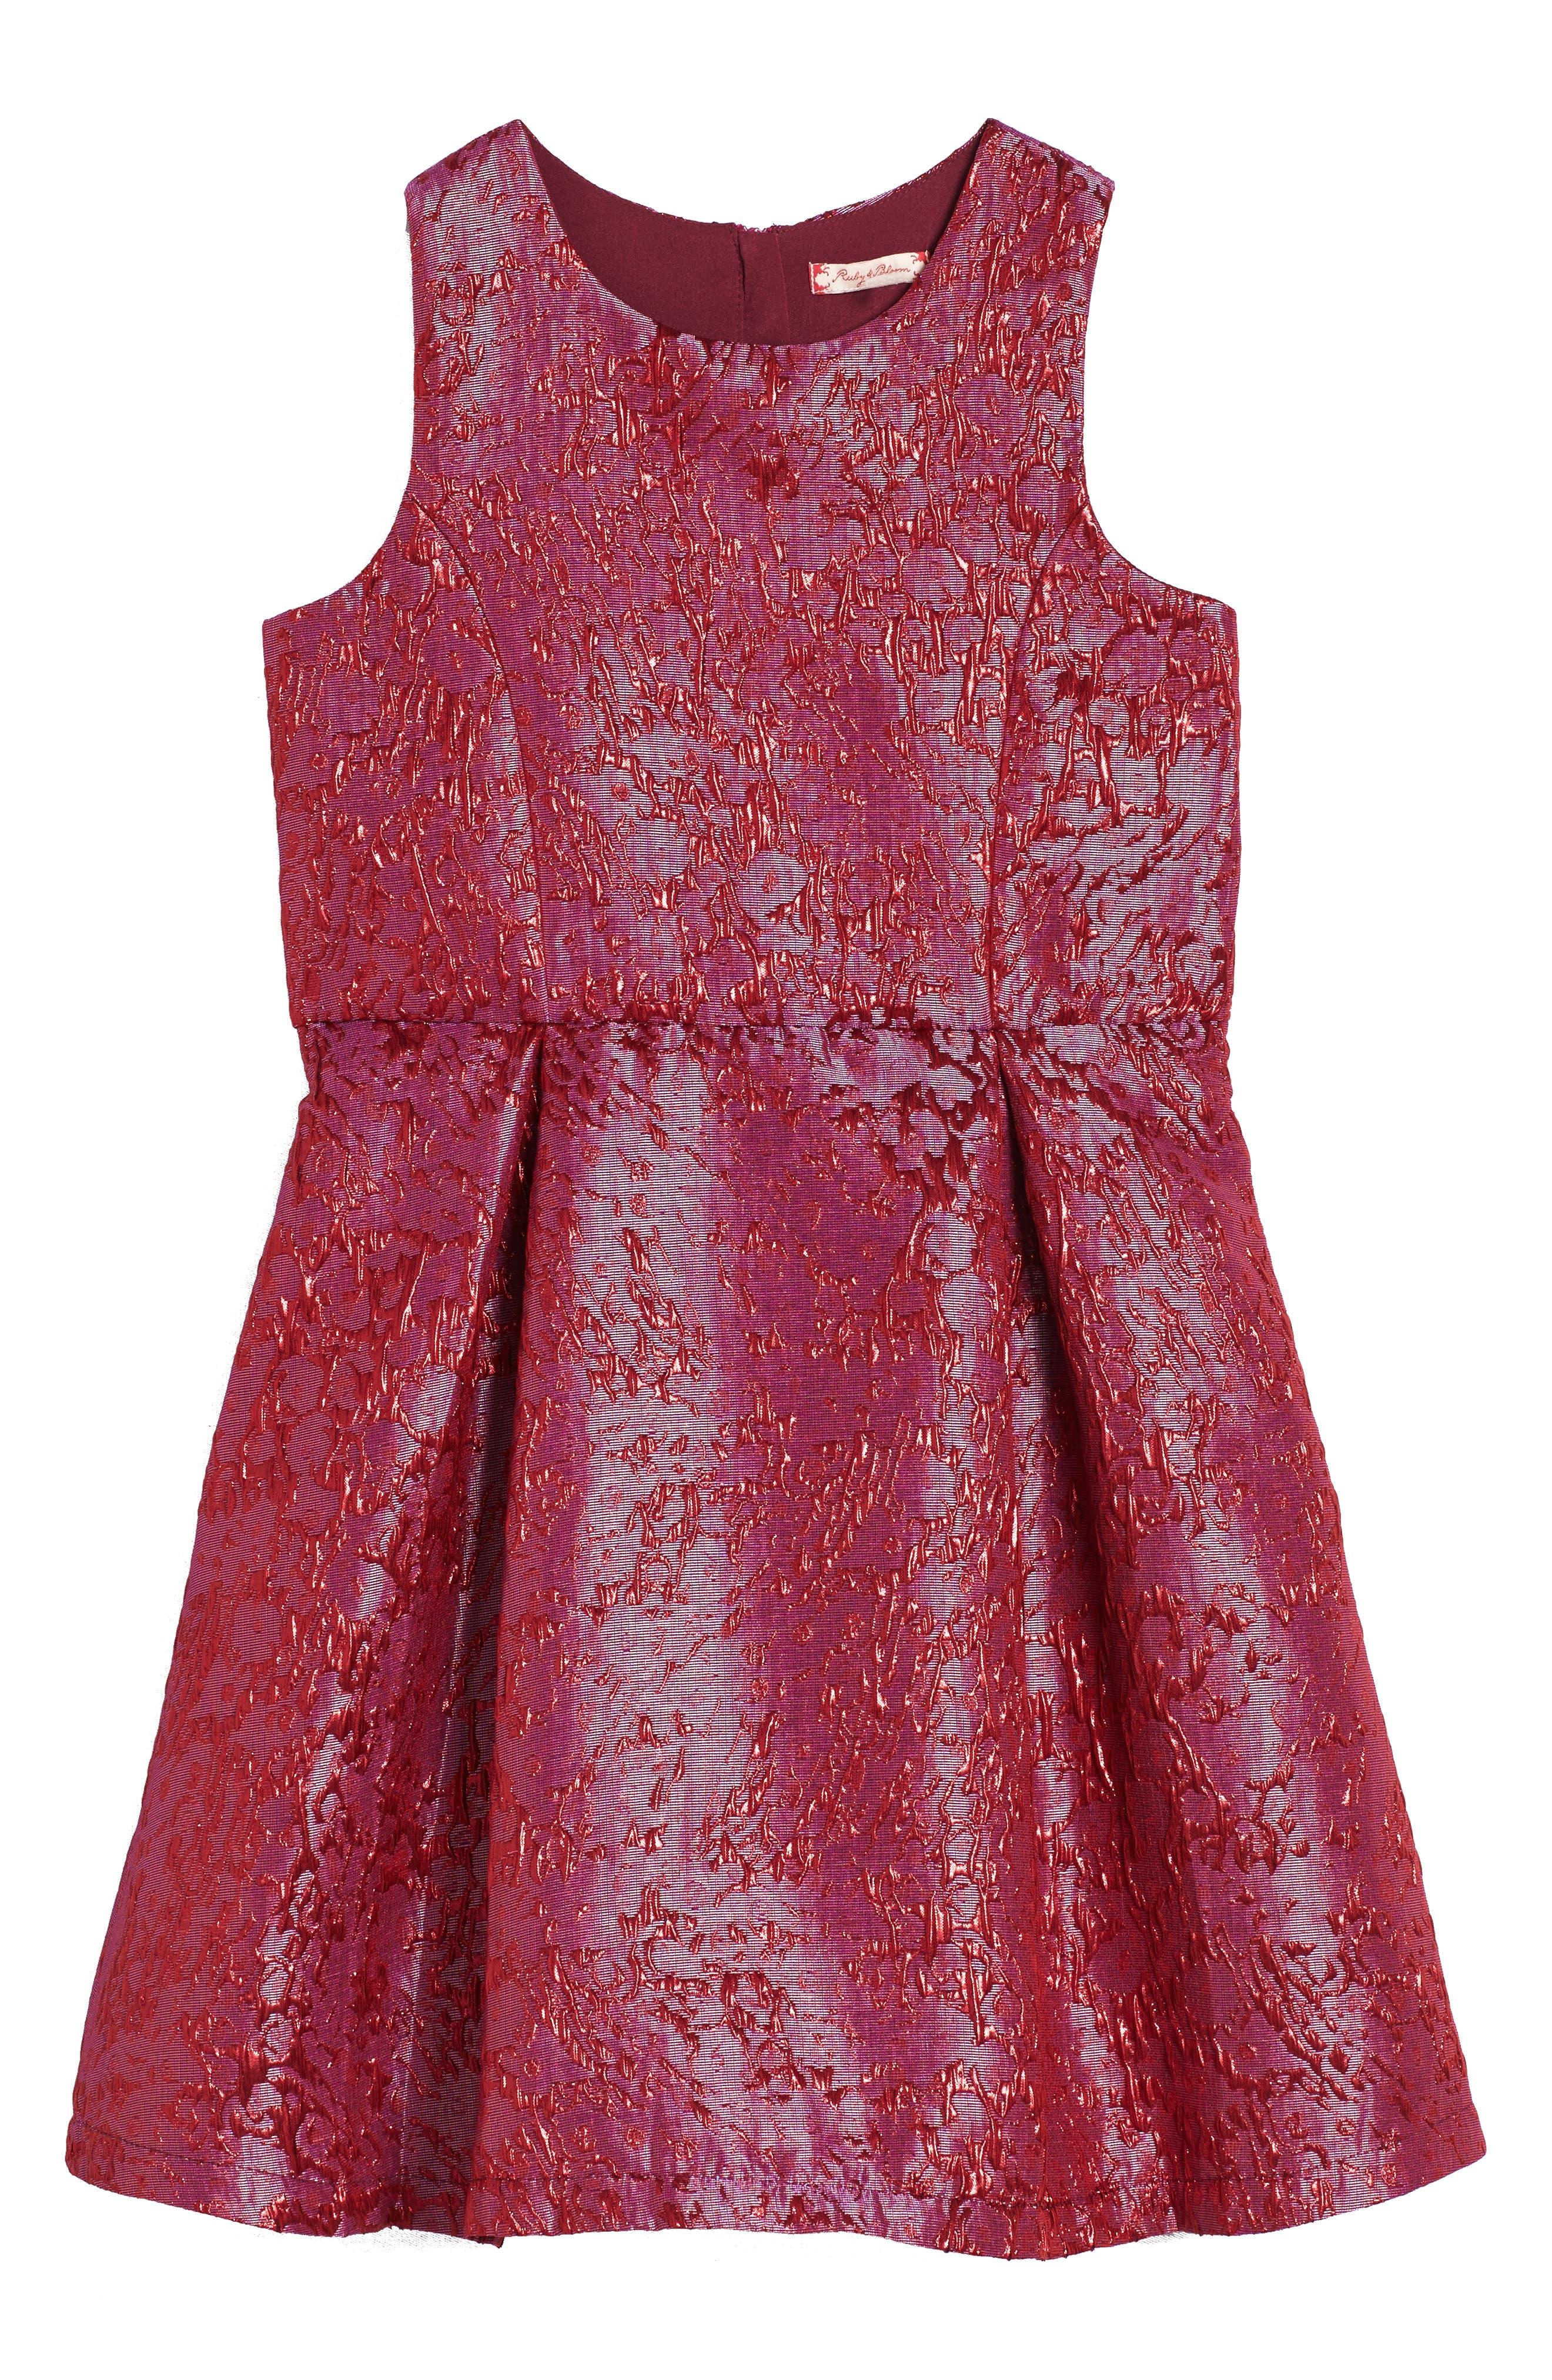 Textured Jacquard Dress,                             Main thumbnail 1, color,                             Pink Virtue Crackle